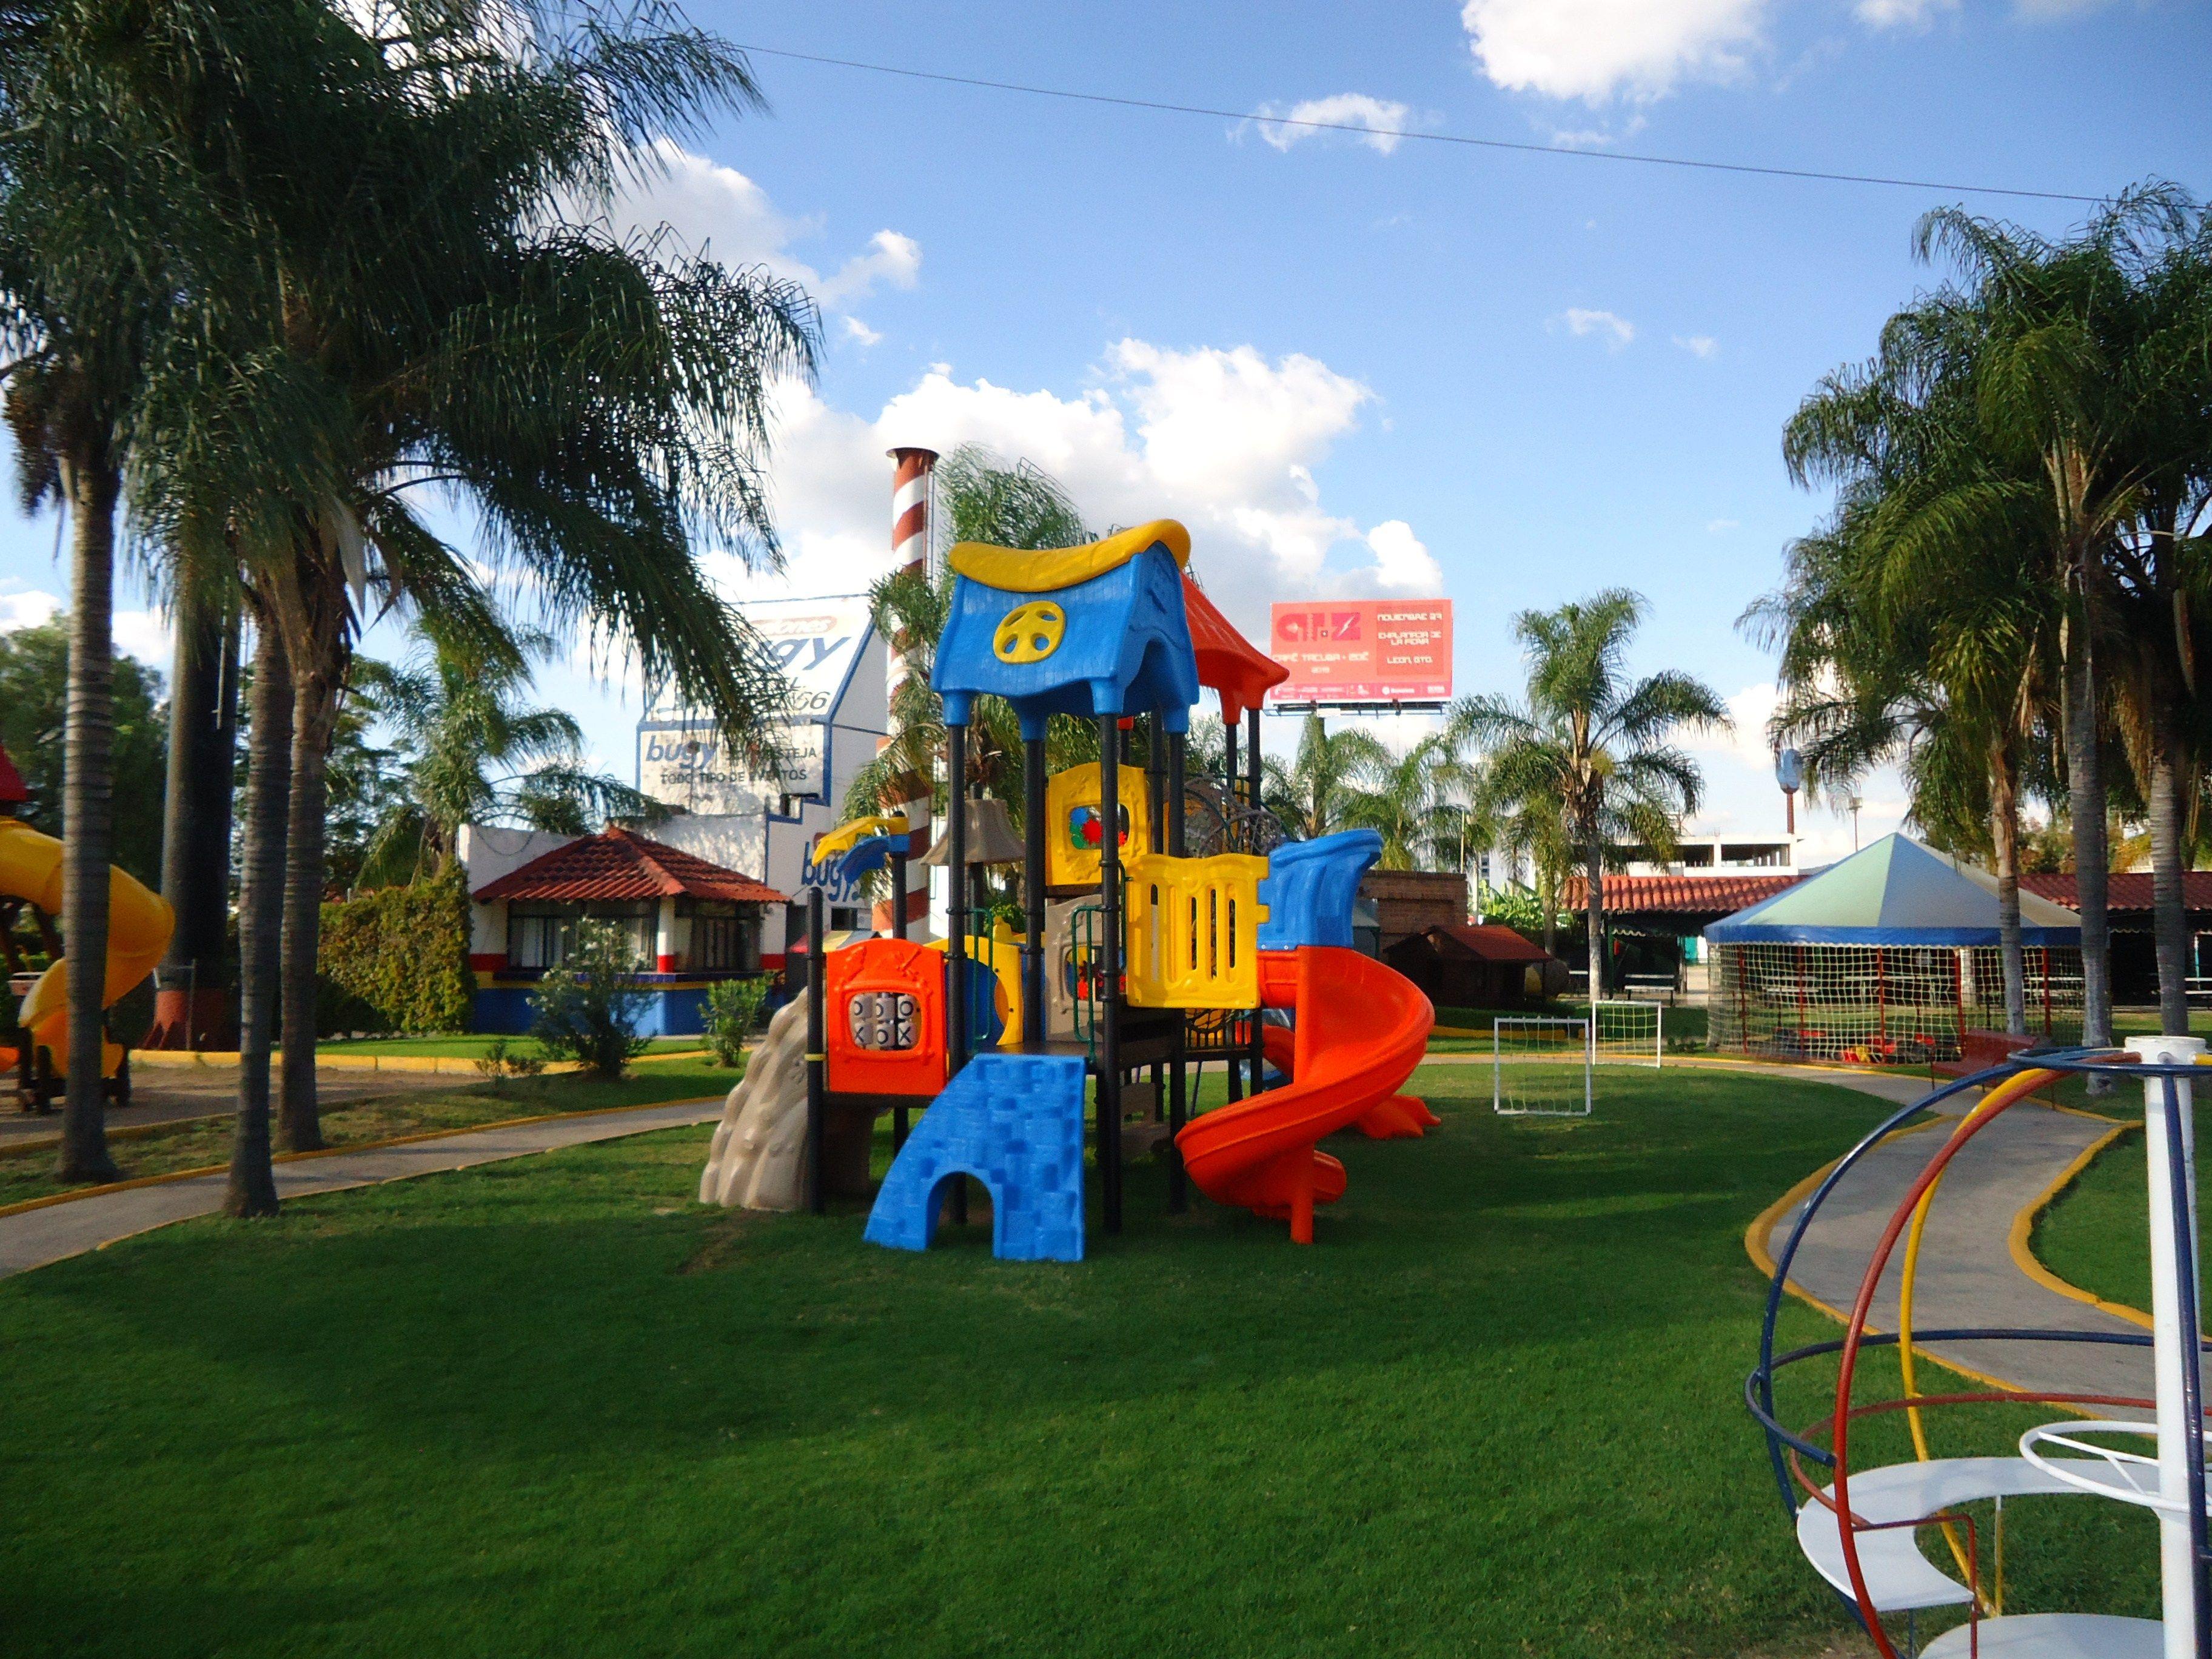 Salones Infantiles Leon Gto Salones De Fiestas Fiestas En